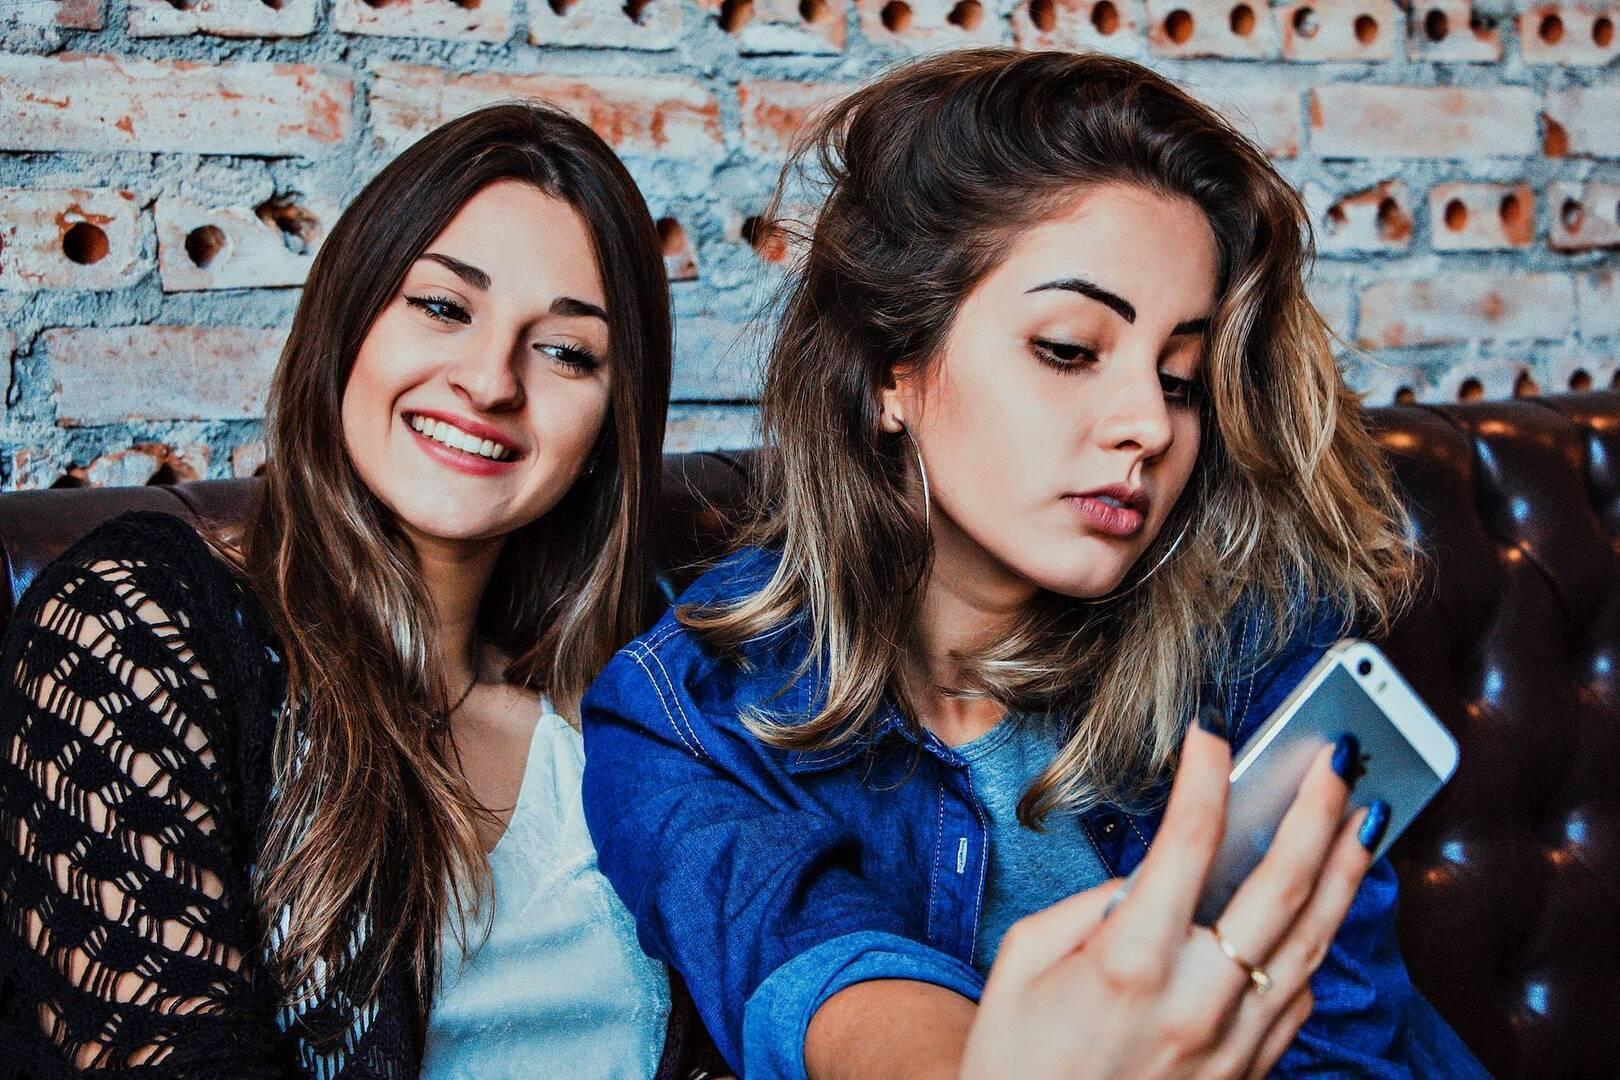 Two ladies taking a selfie